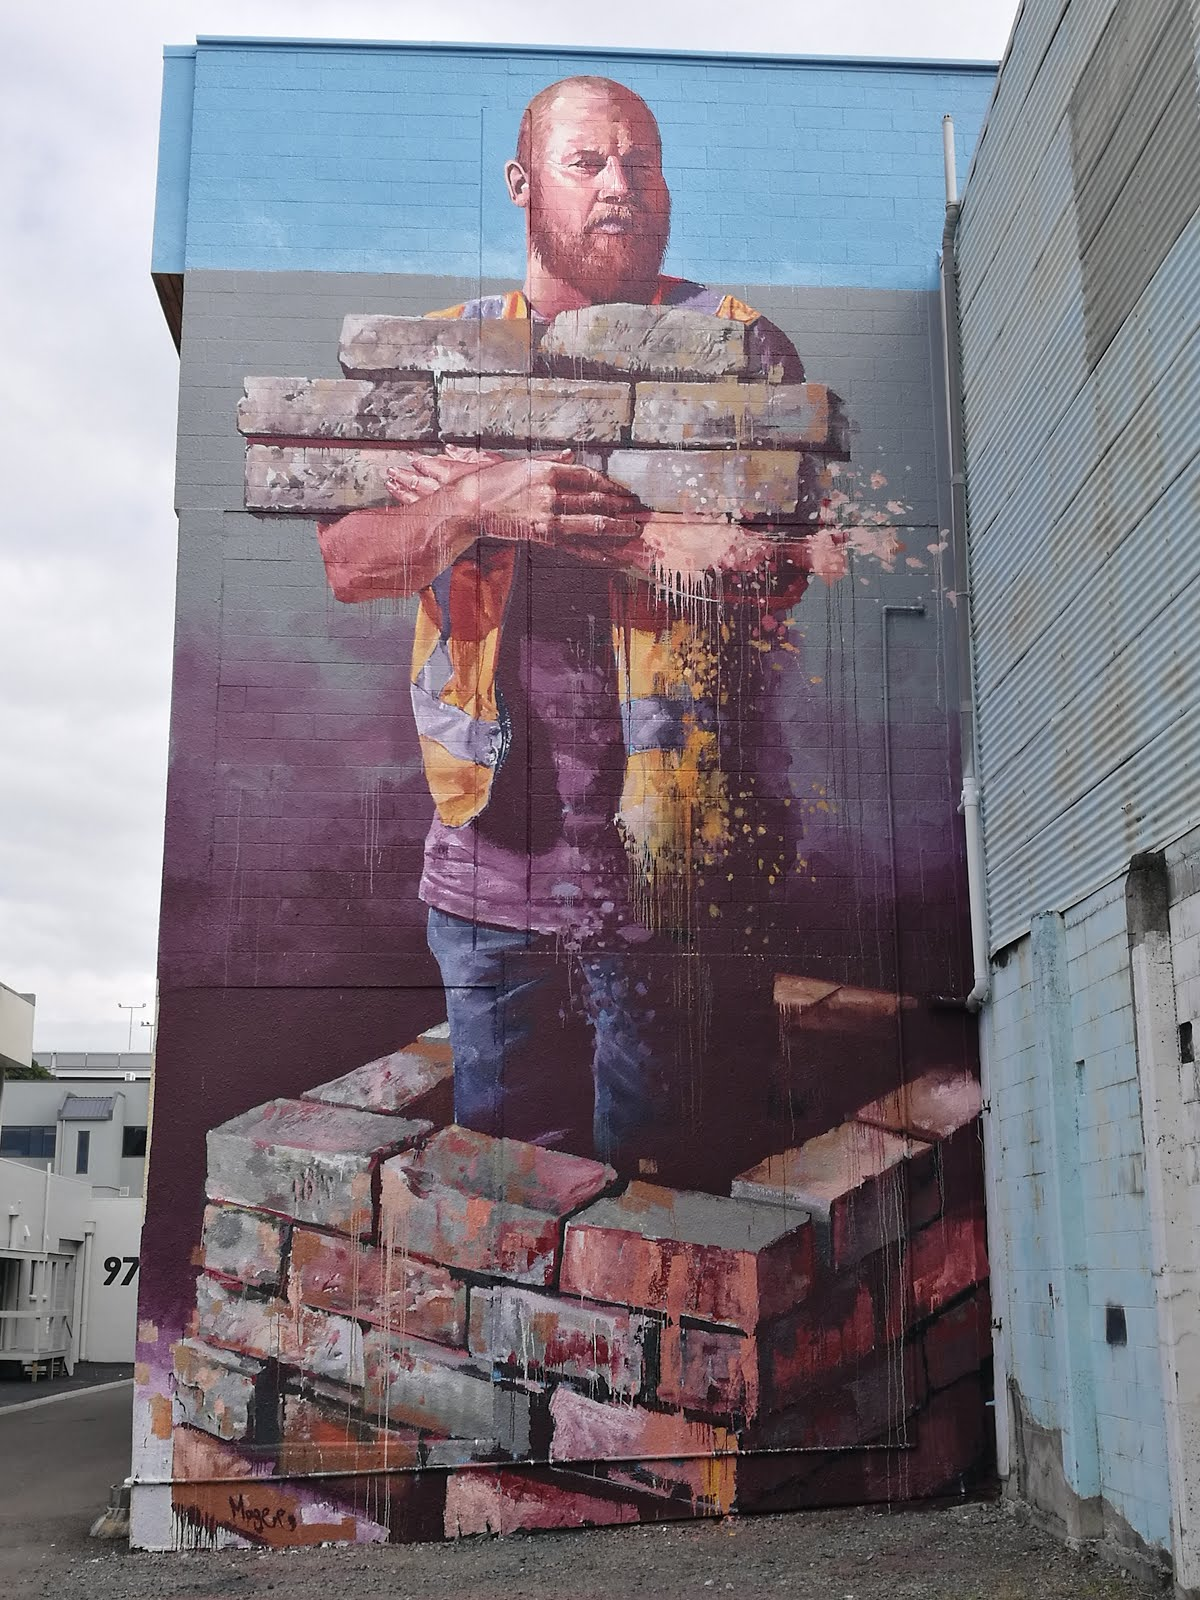 Tauranga New Zealand - Street art